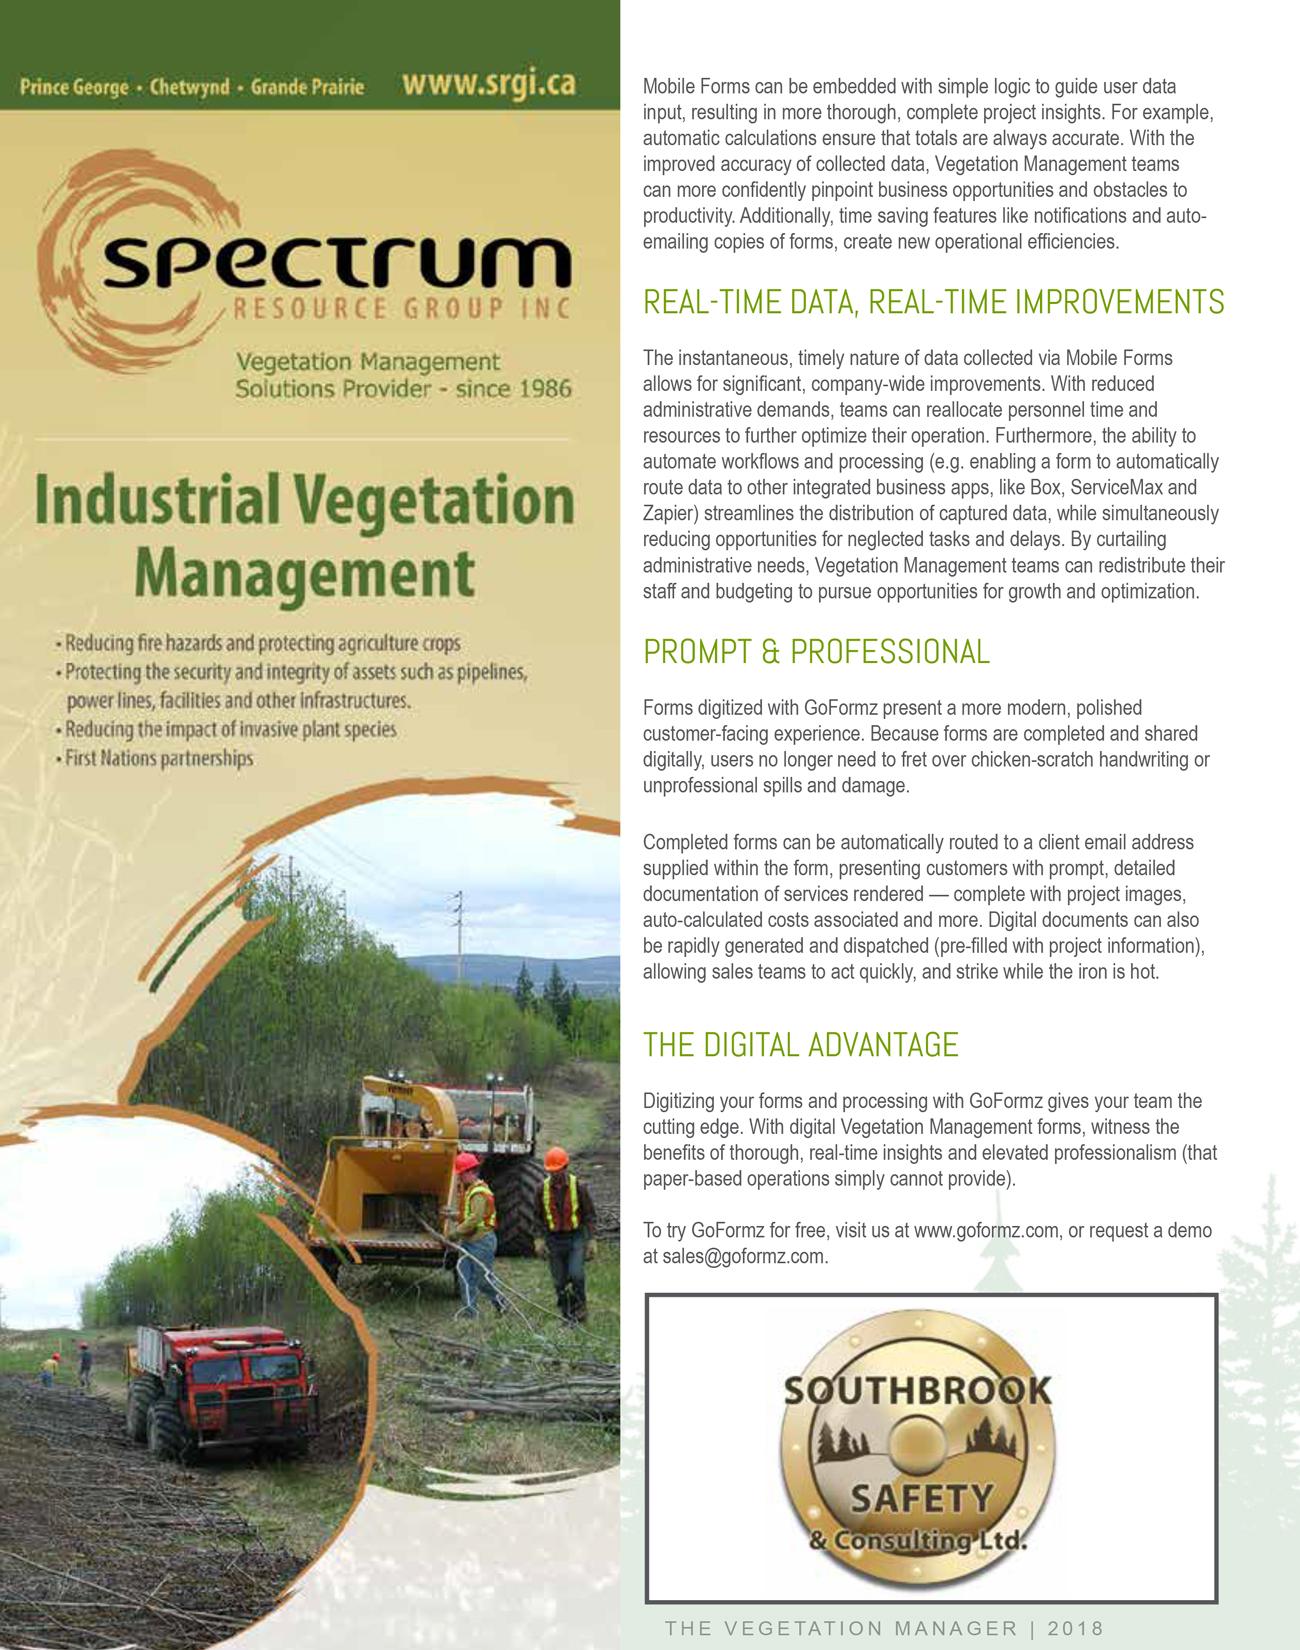 Vegetation Manager Magazine highlights GoFormz - Page 2